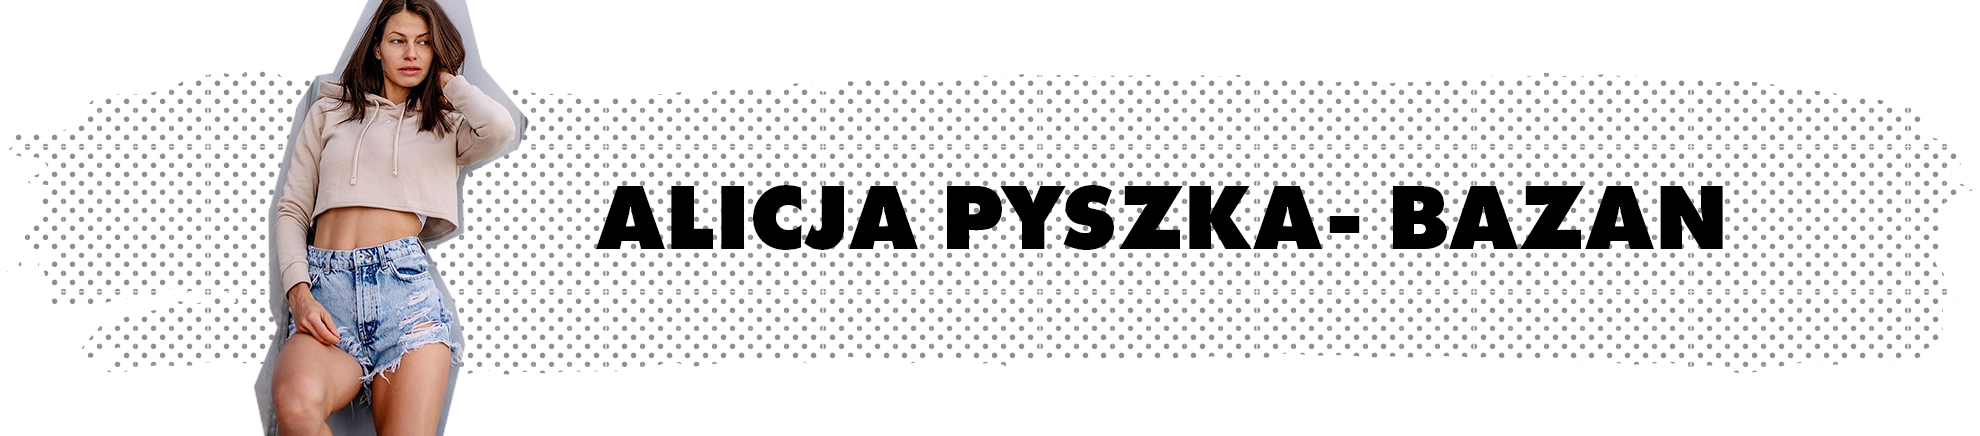 Alicja Pyszka-Bazan FitAla - Carpatree brand ambassador